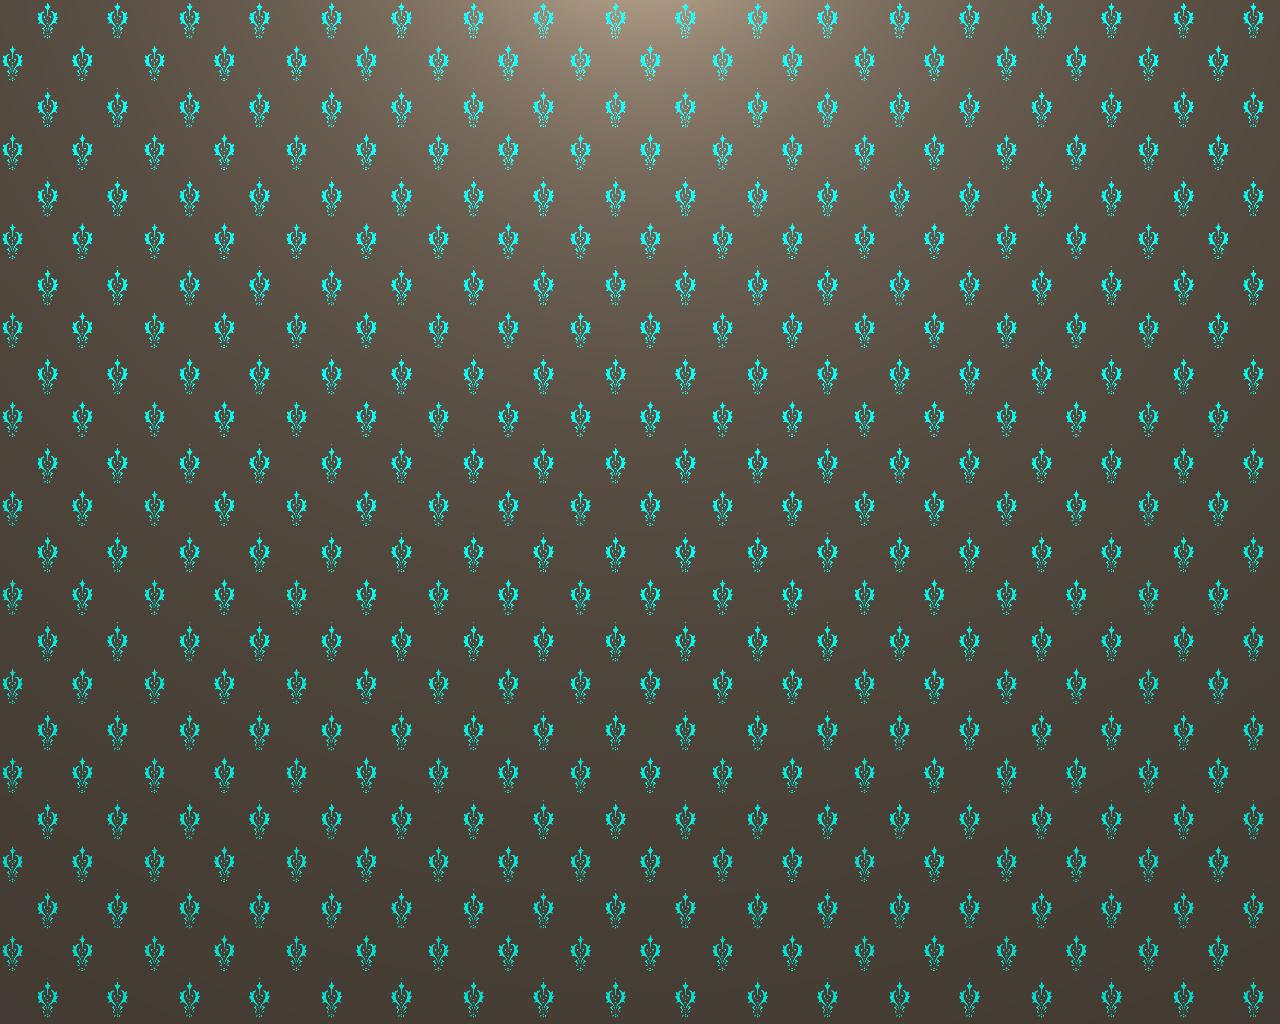 DREAM WALLPAPERS Victorian Wallpaper Patterns 1280x1024